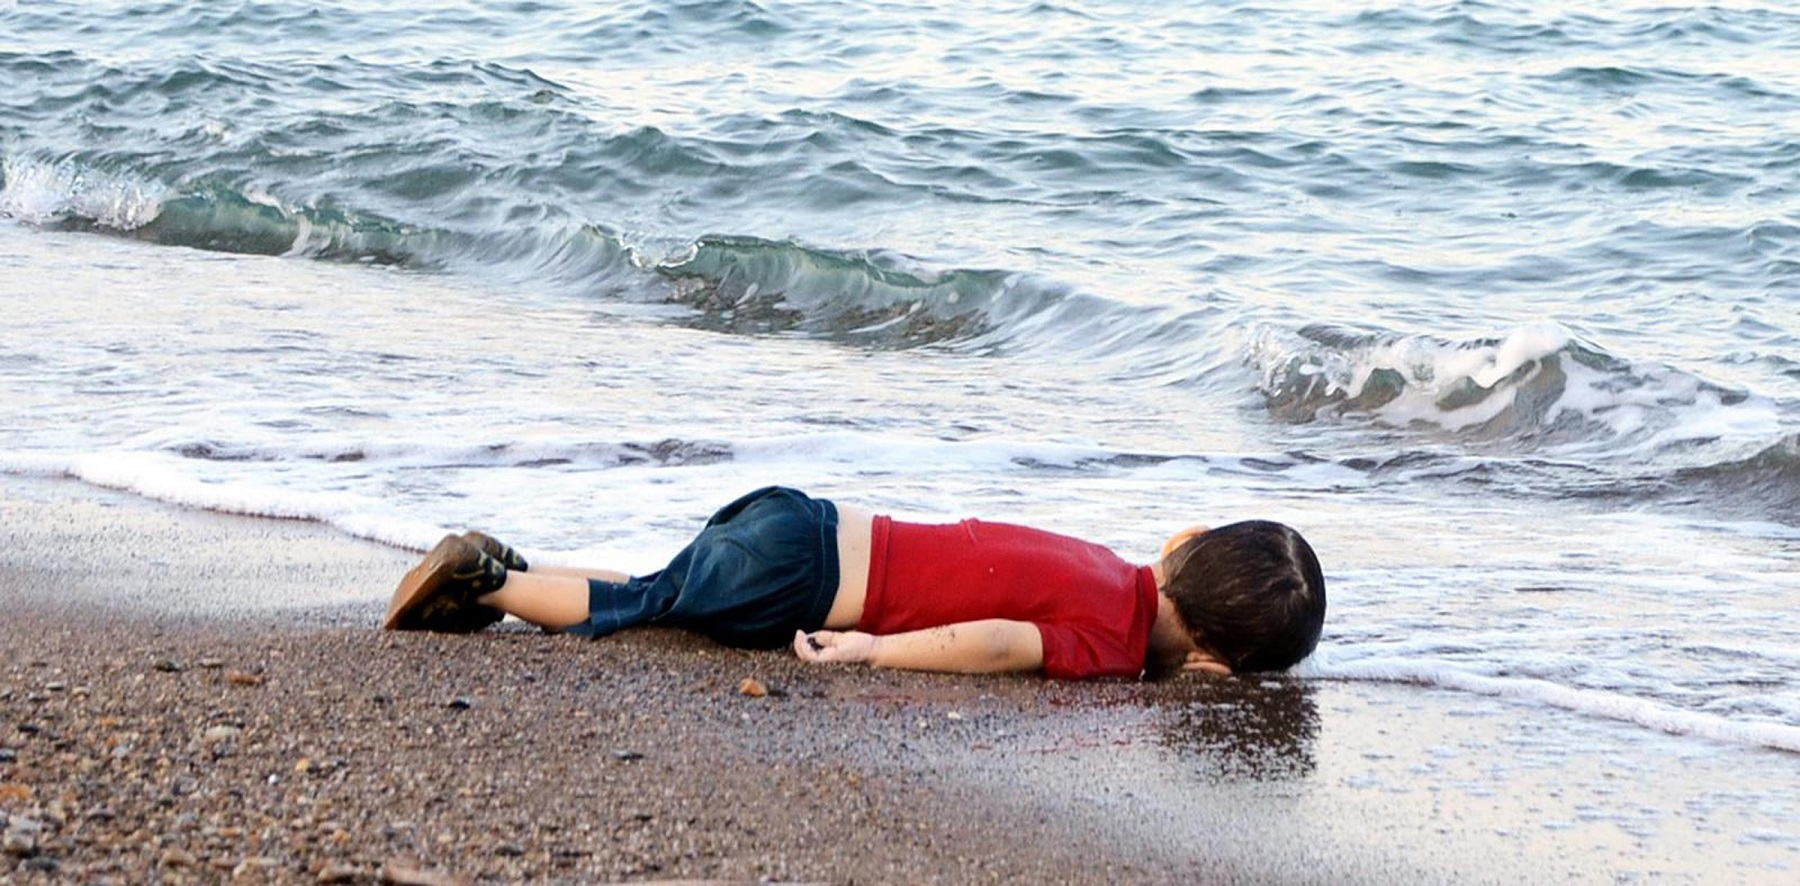 The body of three-year-old Alan Kurdi. Getty Images/Nilufer Demir